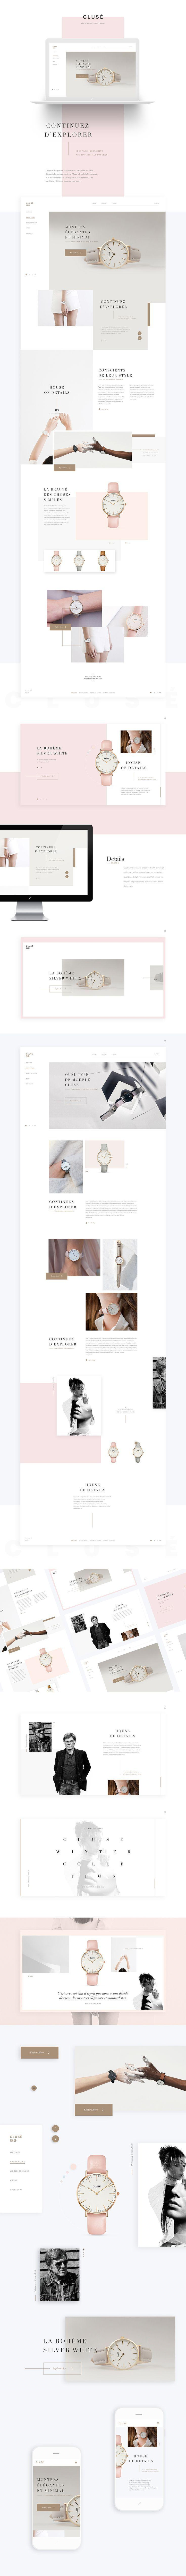 Cluse Web Inspiration Web Layout Design Website Design Inspiration Web Design Inspiration